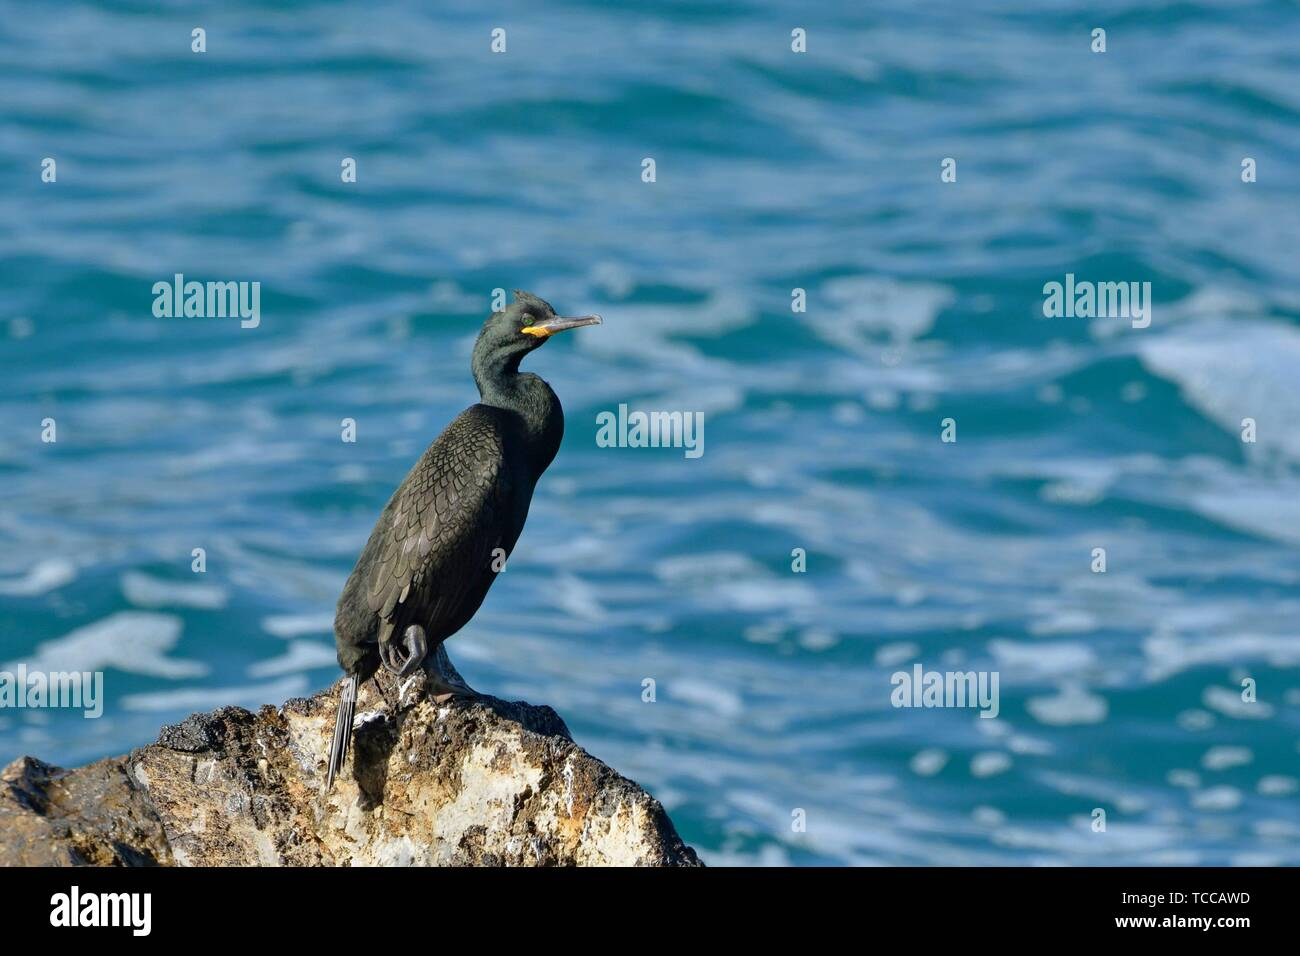 European shag or common shag (Phalacrocorax aristotelis), Crete - Stock Image